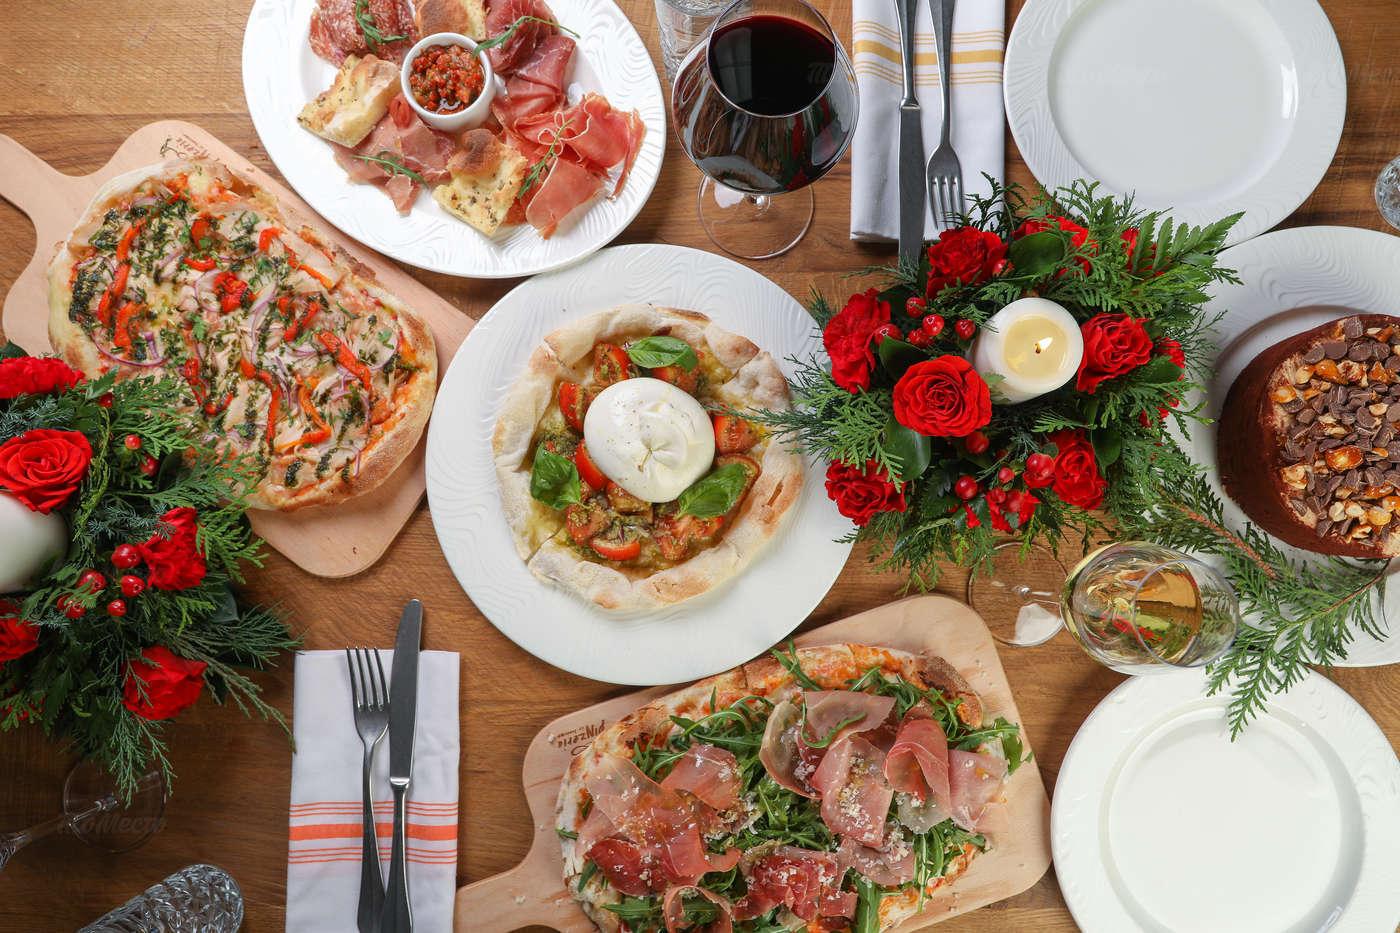 Меню ресторана Pinzeria by Bontempi (Пинцерия Бонтемпи) на Верх-Исетском бульваре фото 65